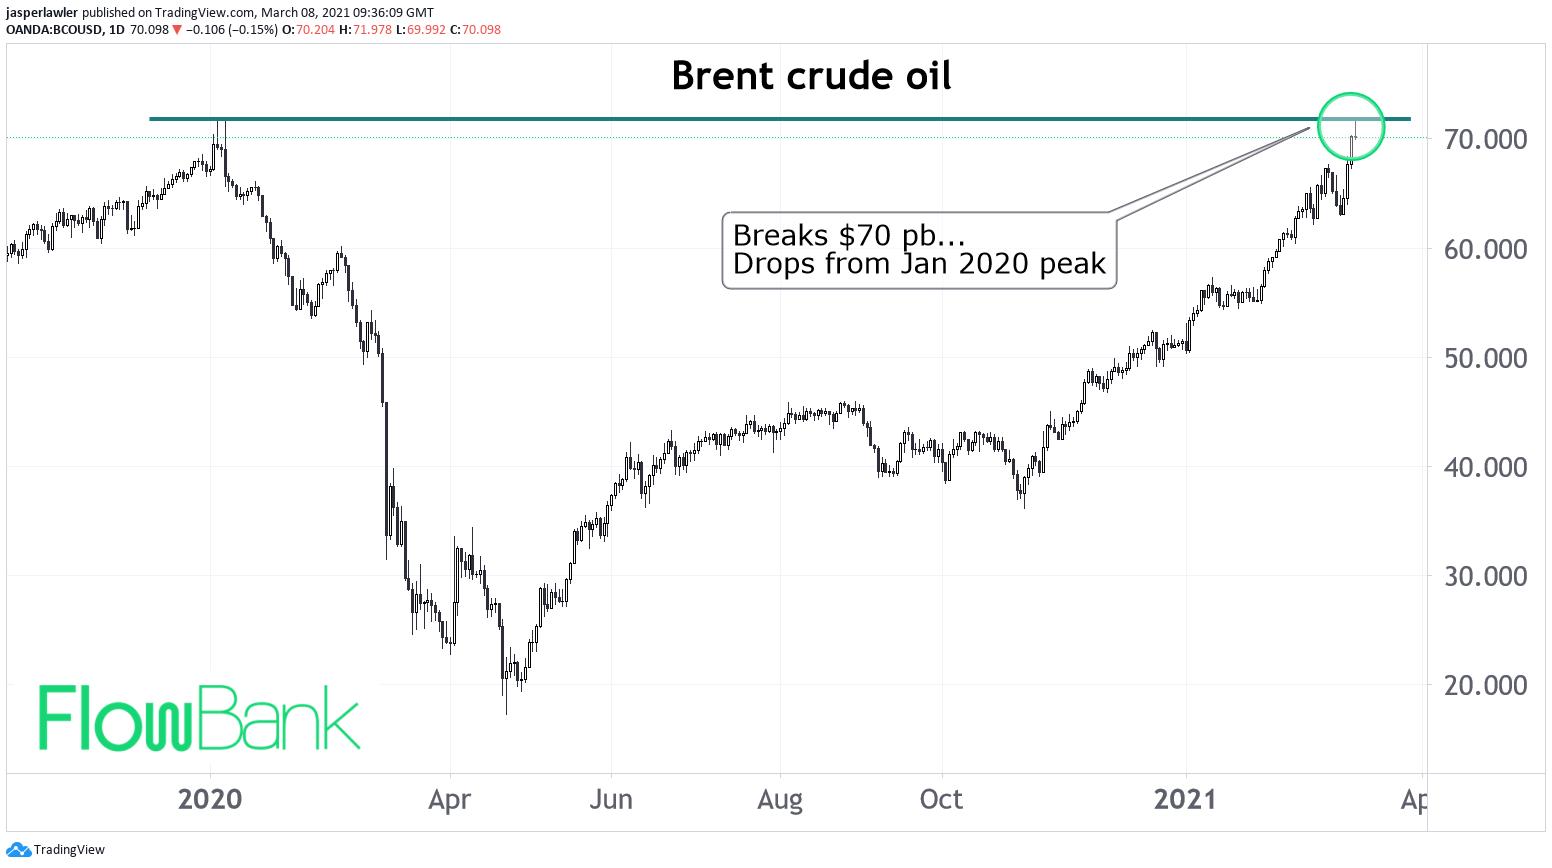 Brent crude oil falls back from Jan 2020 peak and $70 per barrel